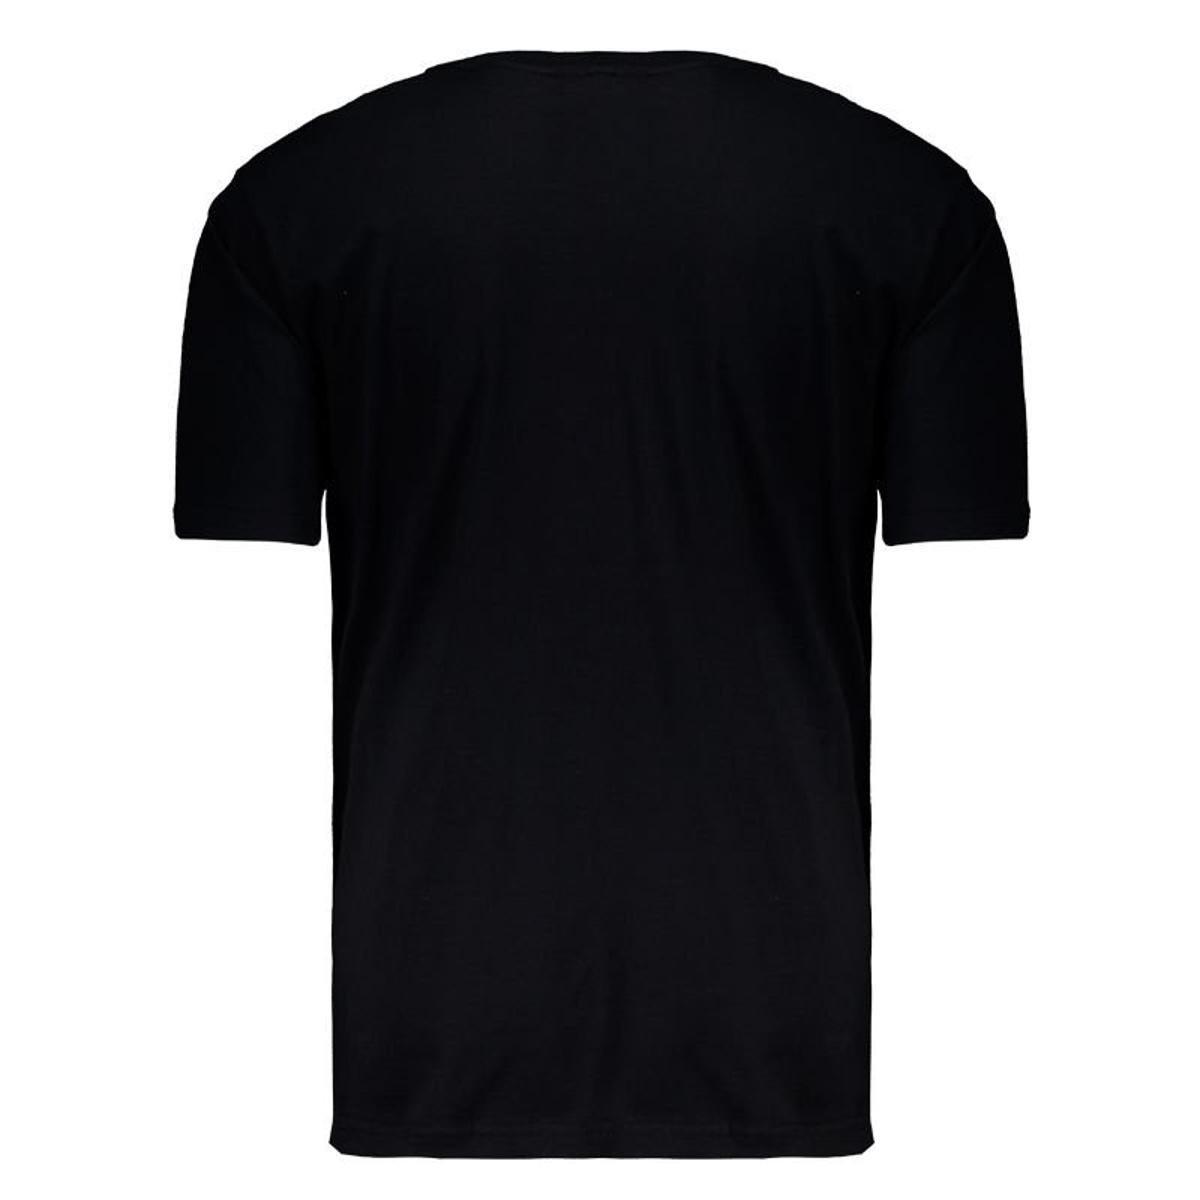 Camiseta Fatal Bloom Estampada - Preto